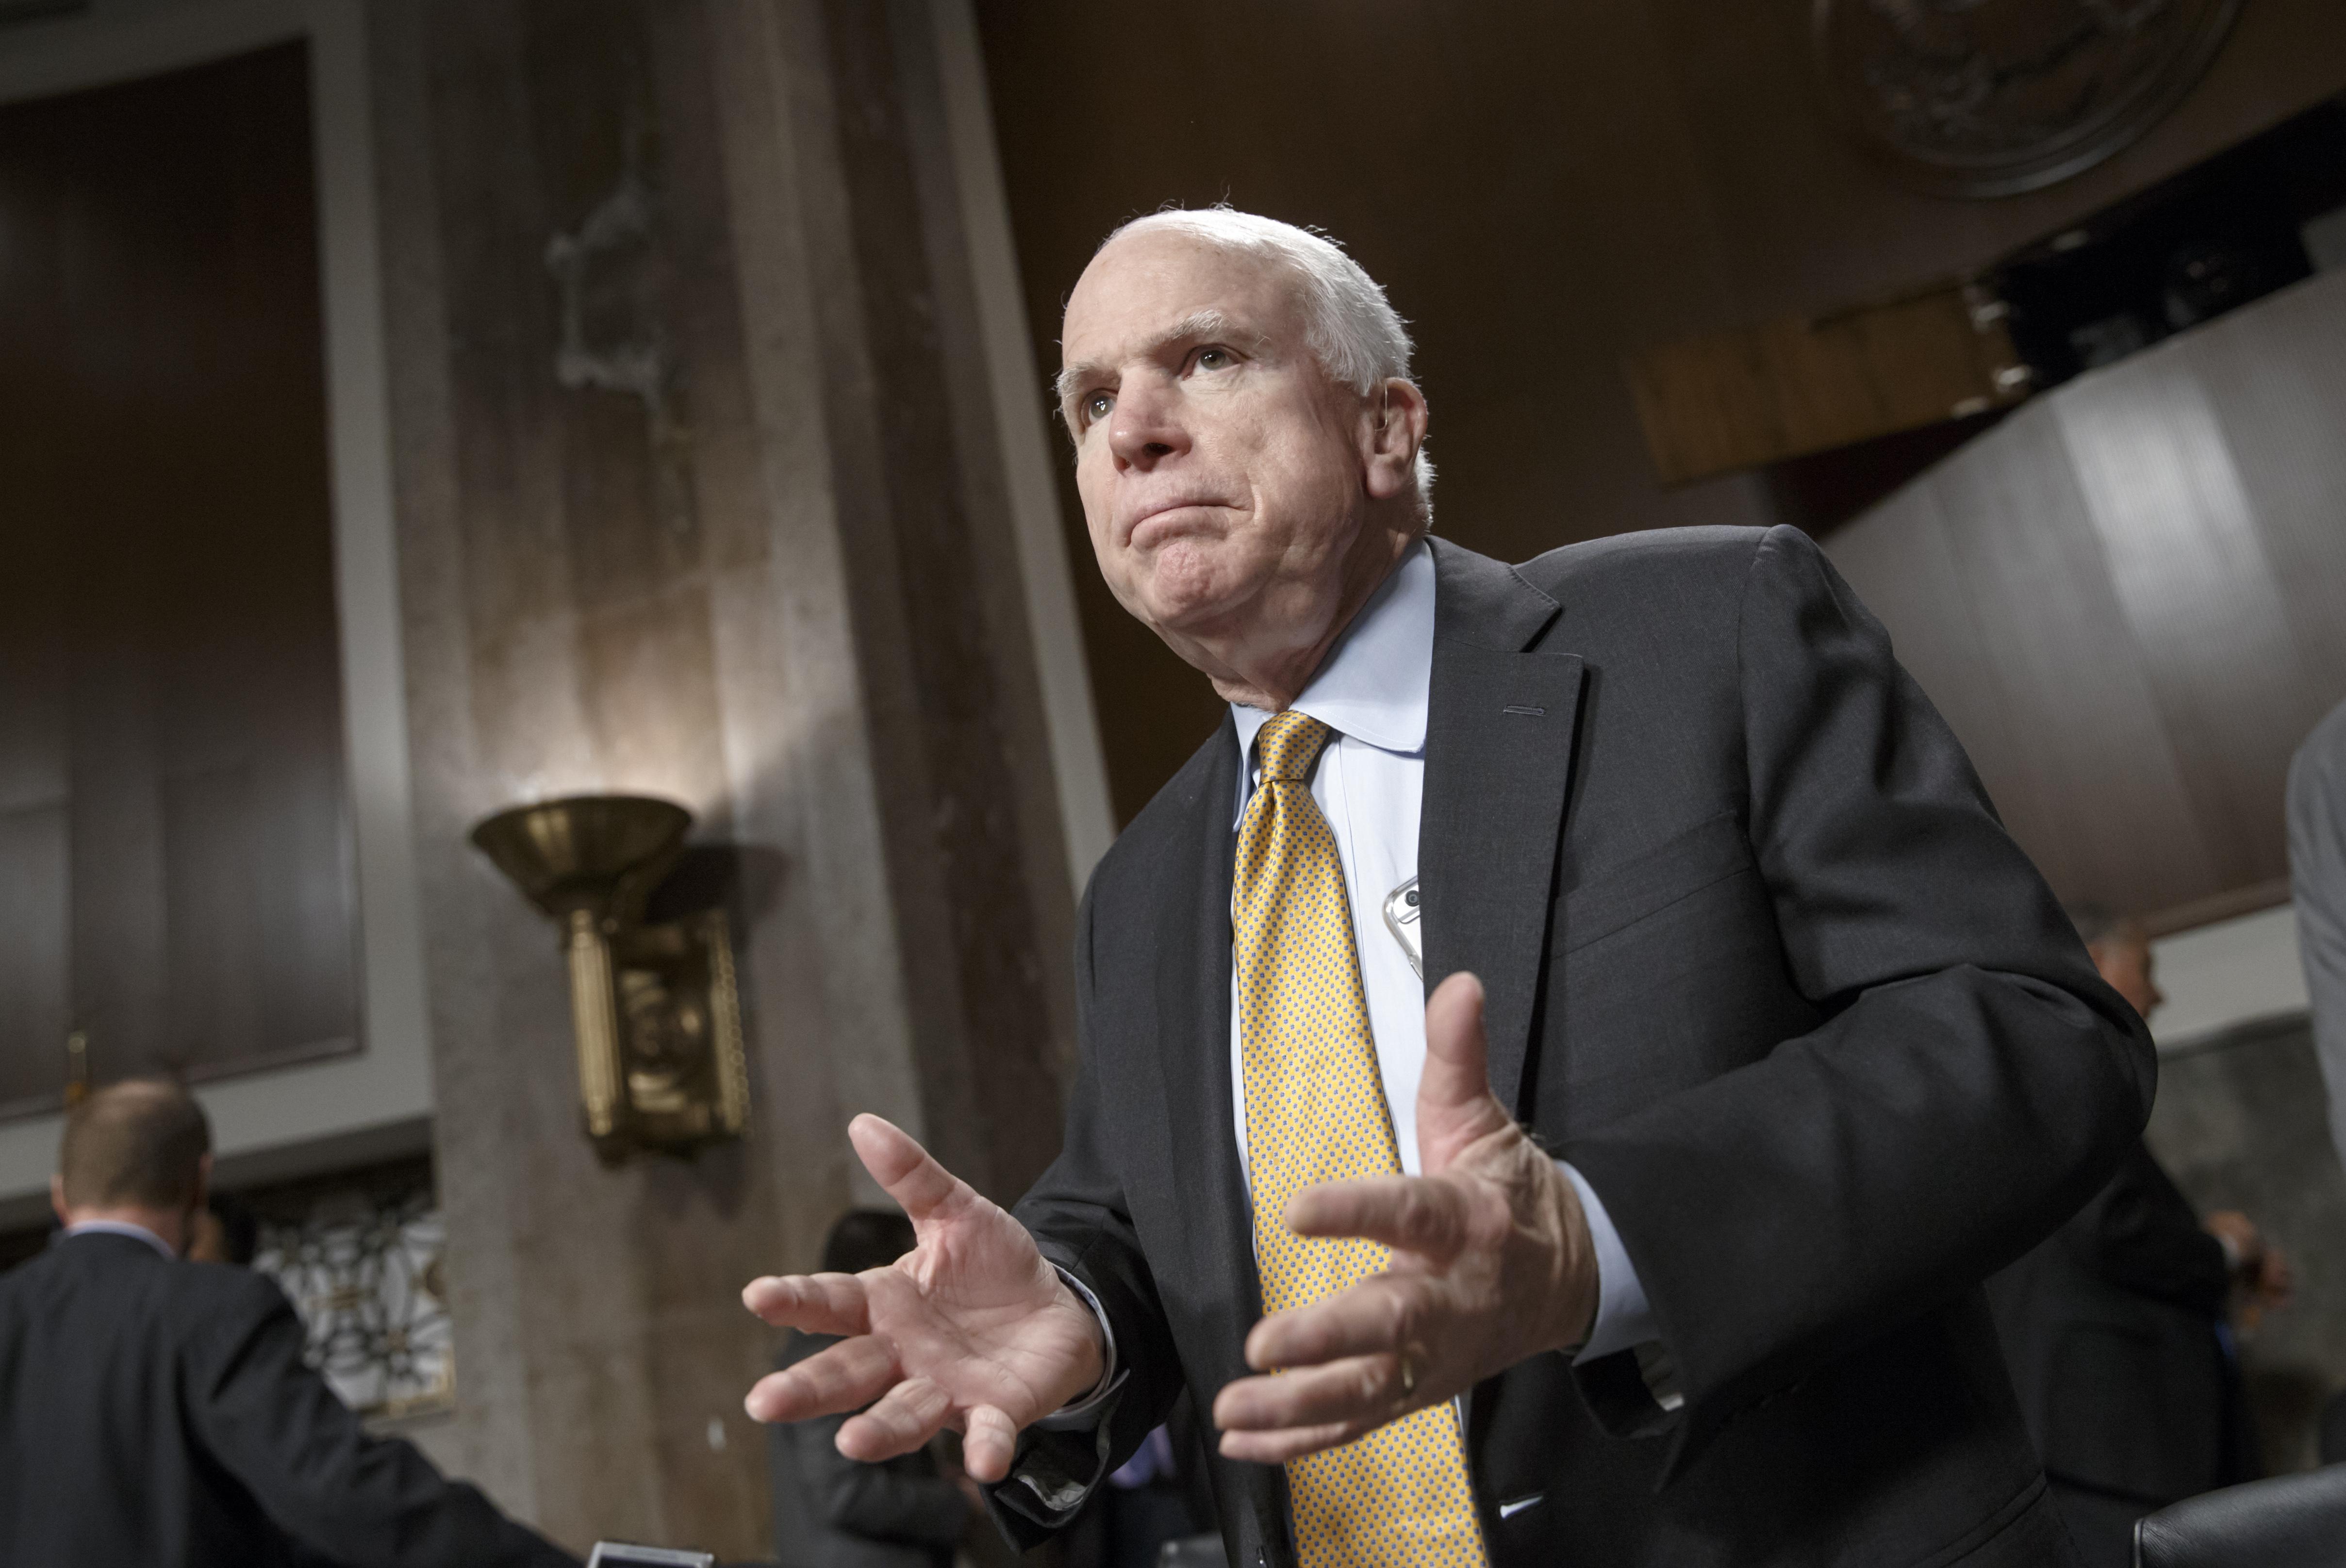 Senate Armed Services Committee Chairman Sen. John McCain (R-Ariz.) on Capitol Hill in Washington, Wednesday, Feb. 4, 2015.